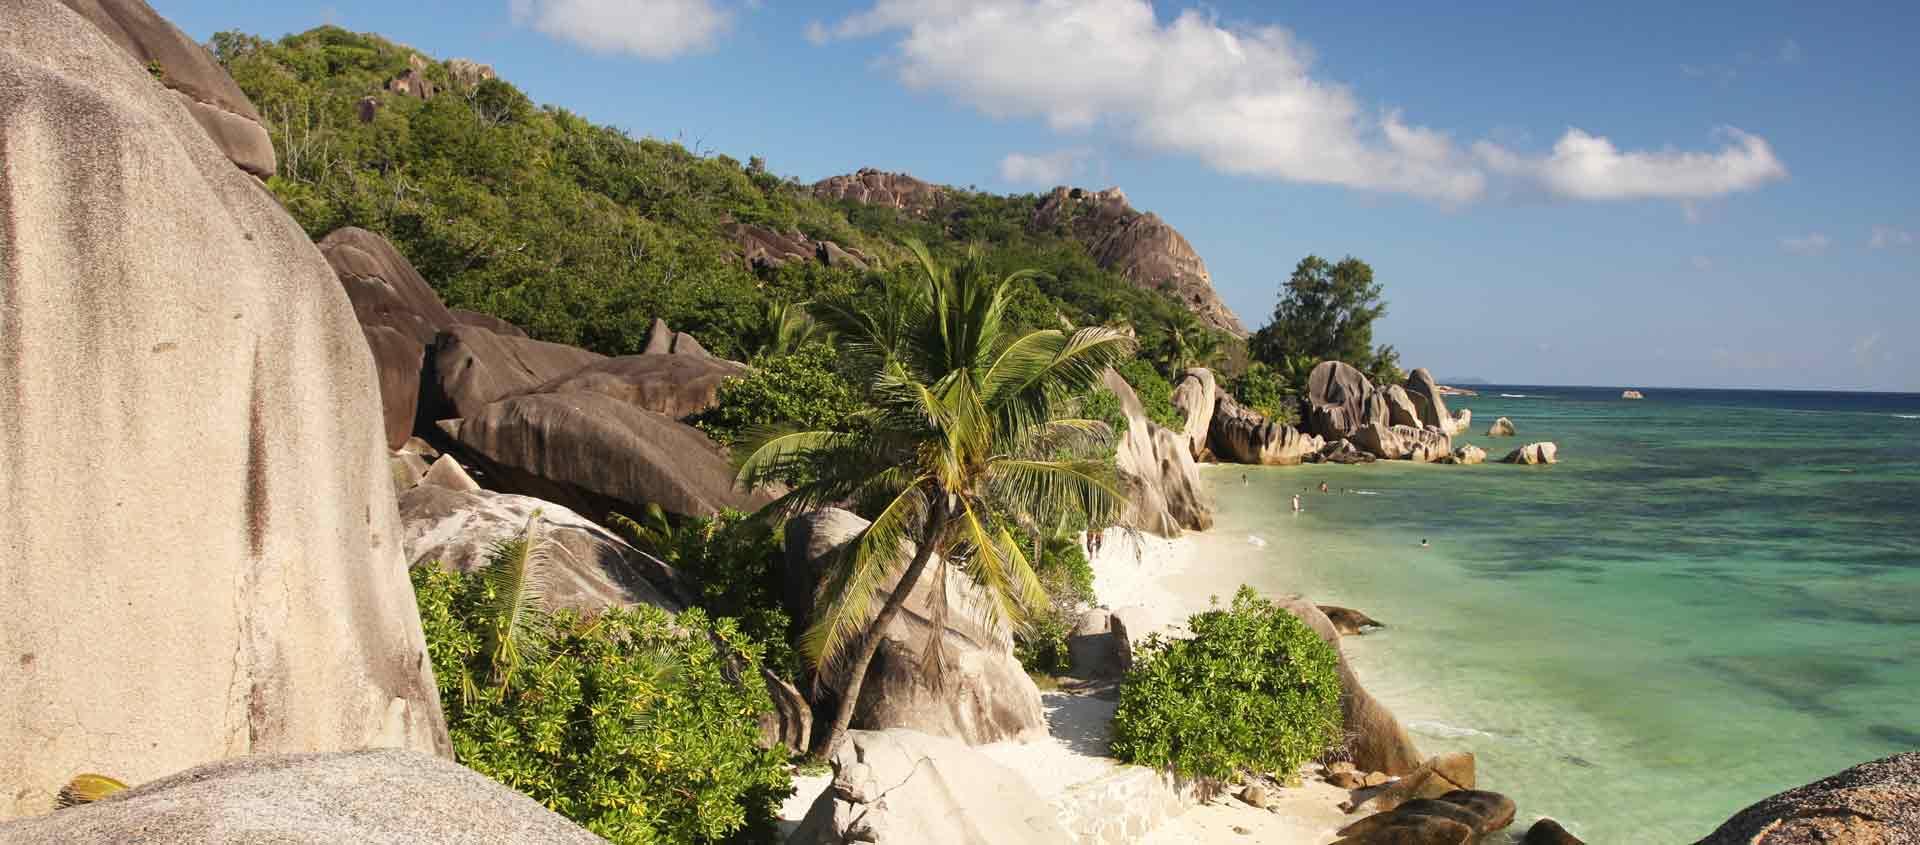 Seychelles cruise photo of beach on La Digue